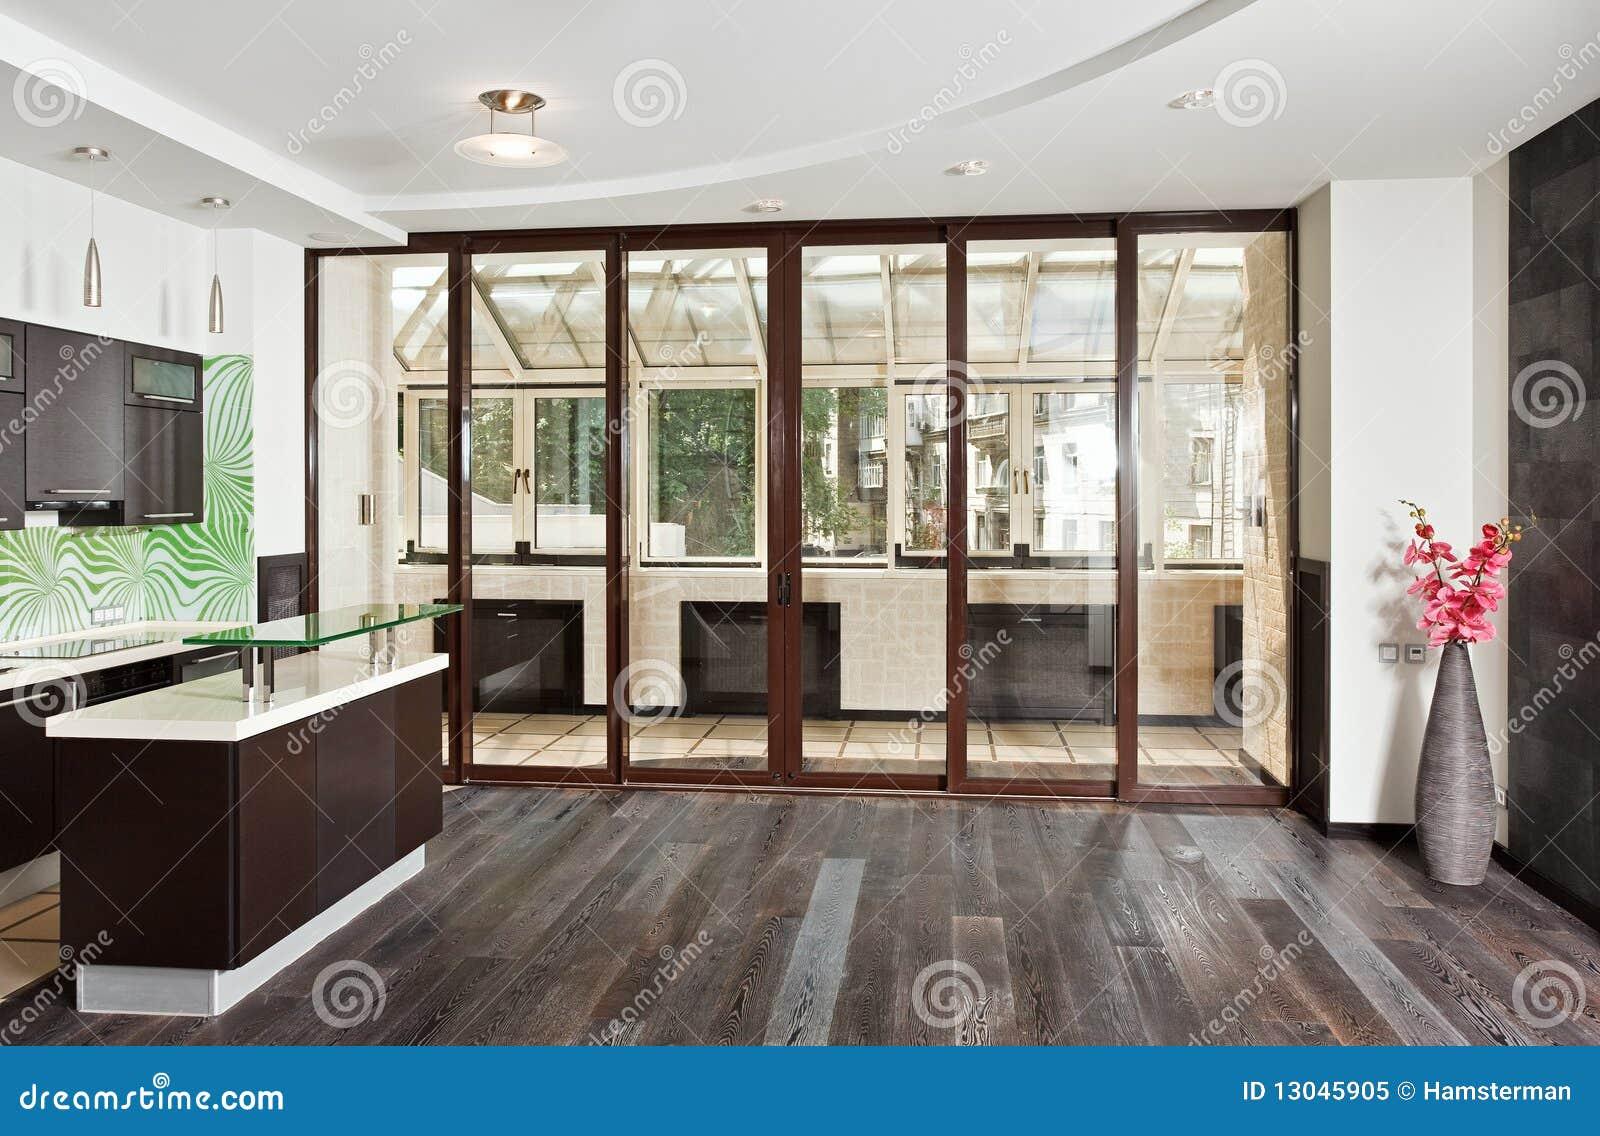 Moderne woonkamer en keuken met balkon royalty vrije stock foto beeld 13045905 - Moderne keuken en woonkamer ...